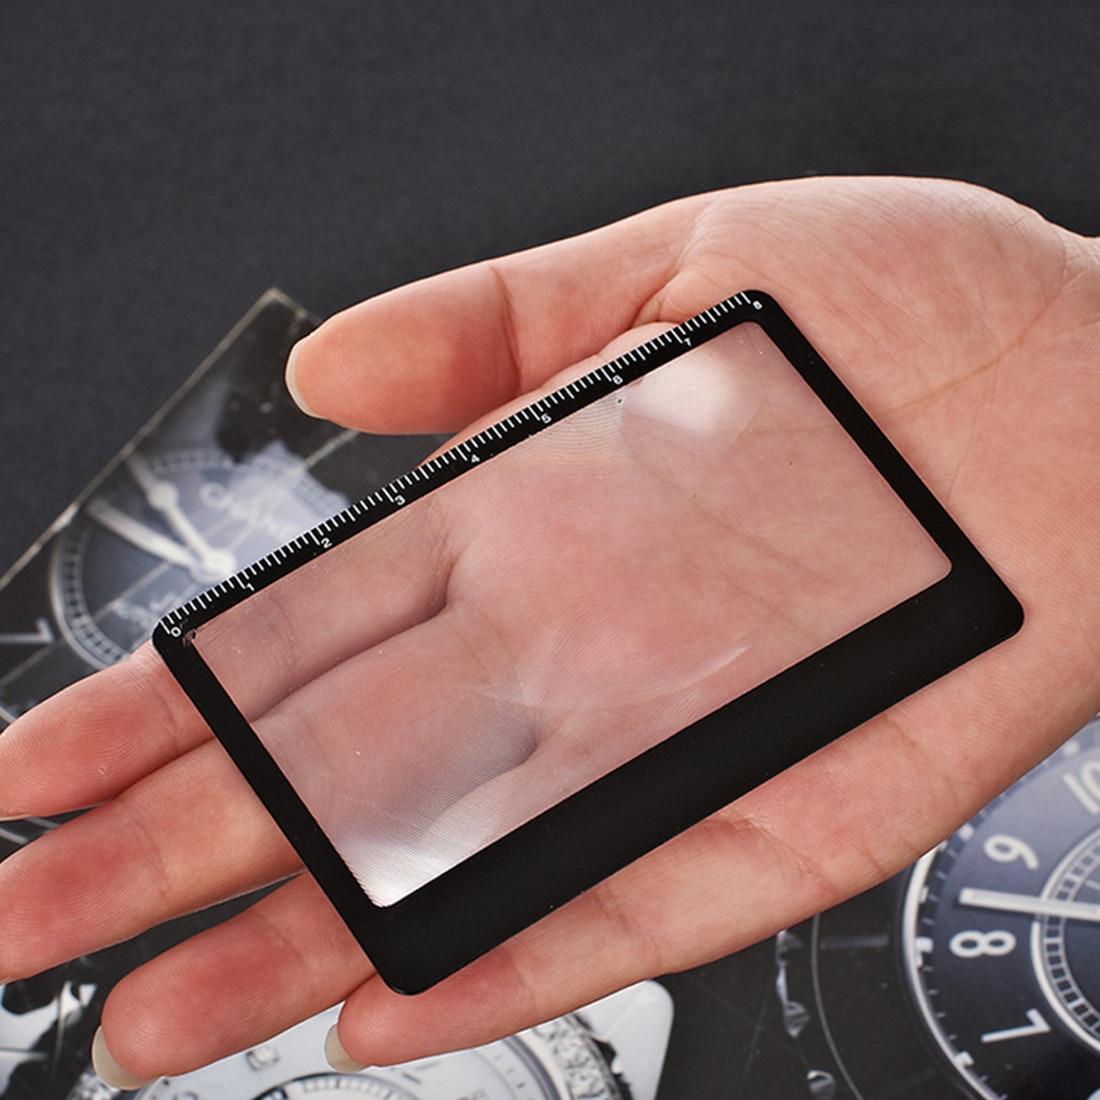 Credit Card 3 X Magnifier Magnification Magnifying For Fresnel Lens